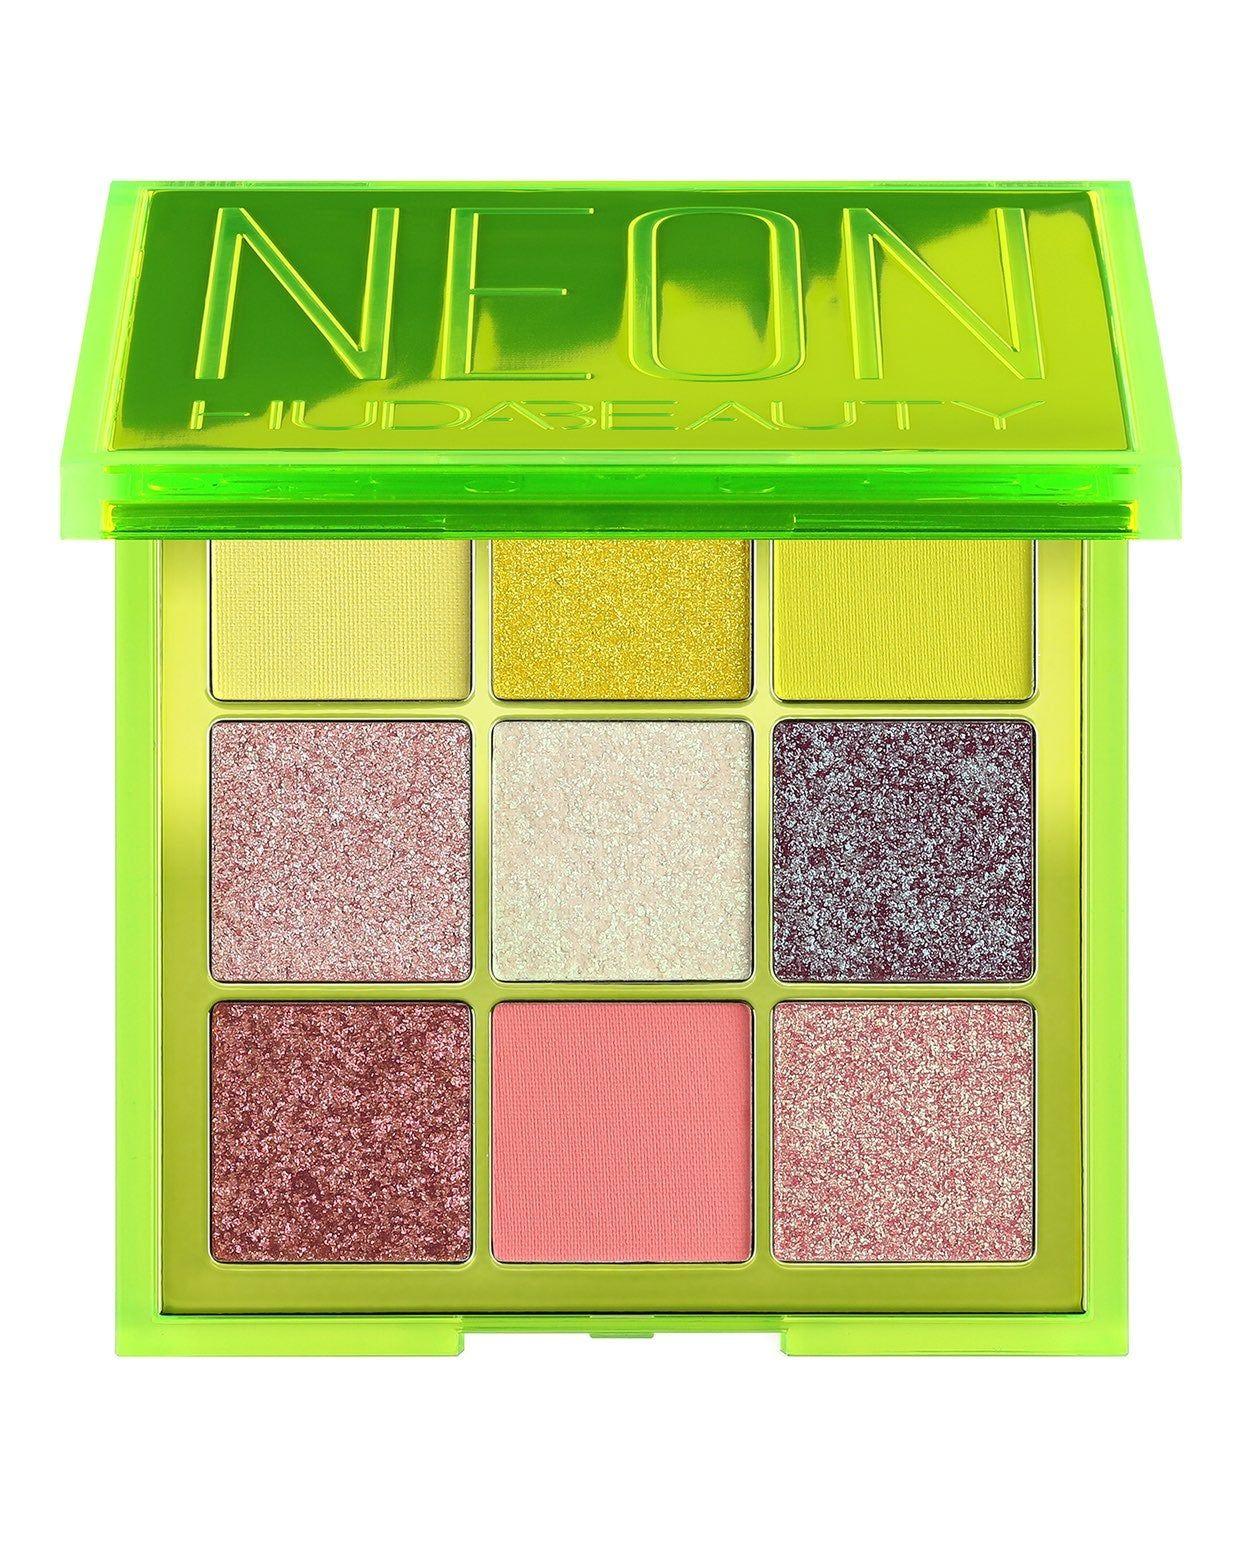 Huda Neon Eyeshadow Palette 9.9g £11.98 delivered @ TK Maxx